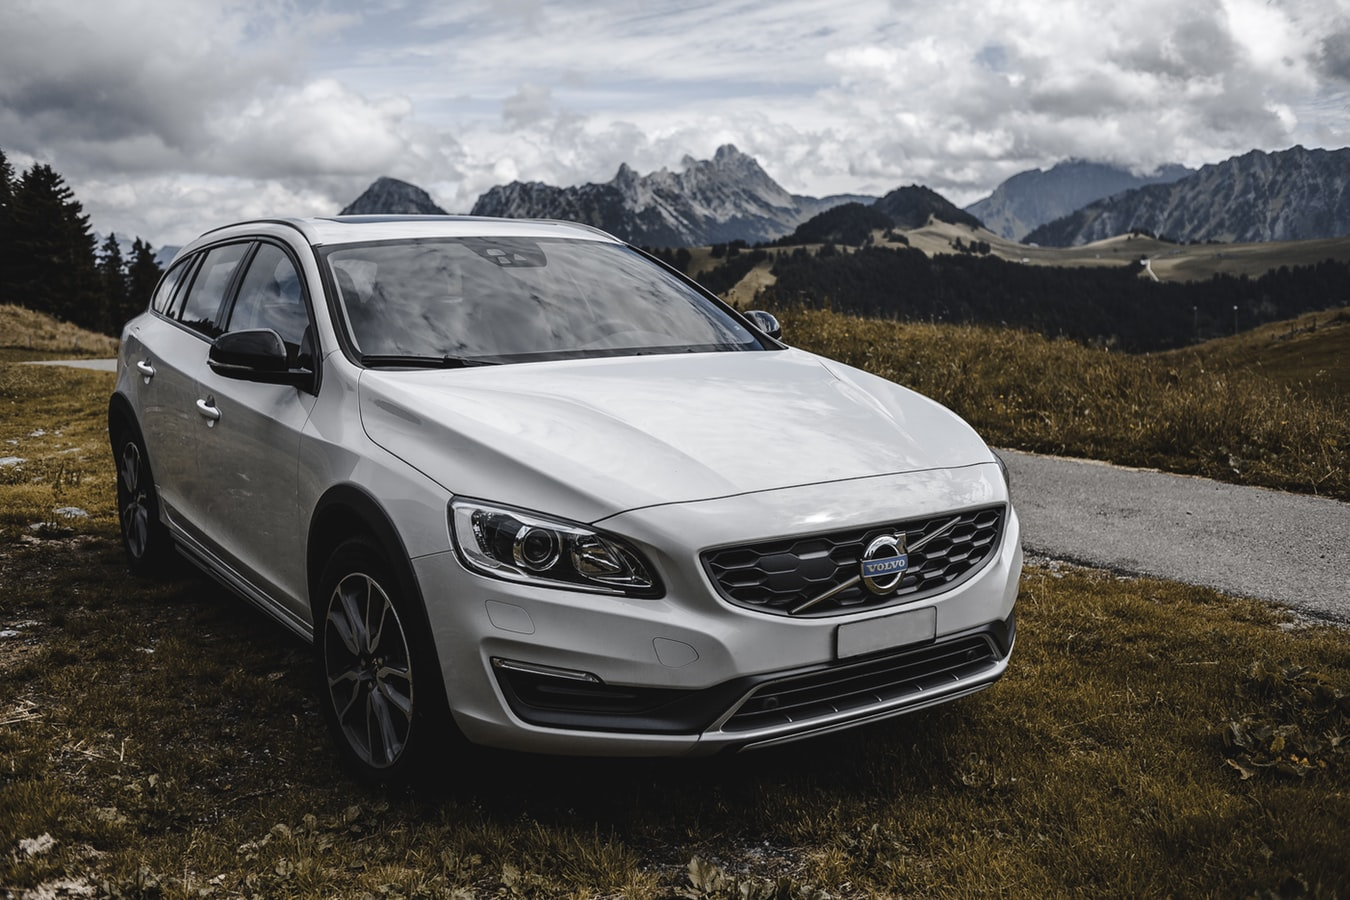 Silver Volvo car